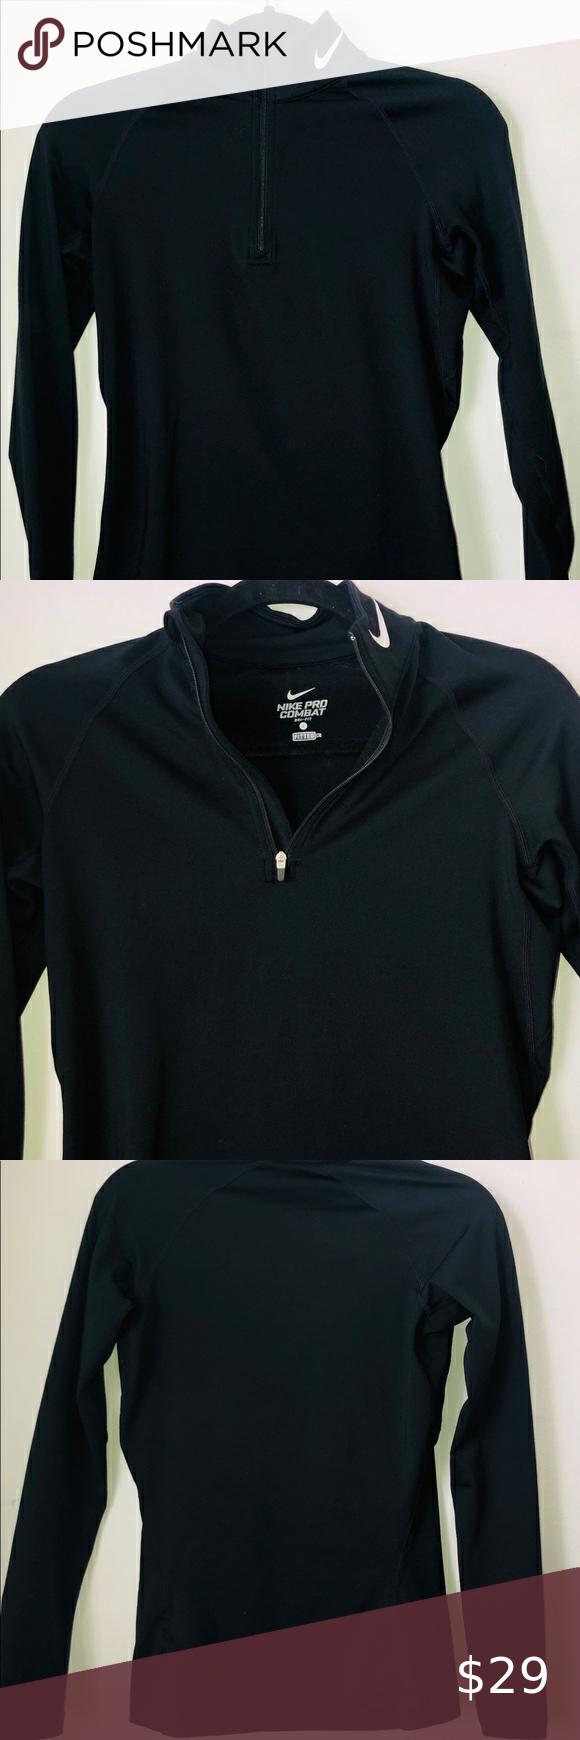 Nike Dri Fit Black Sweatshirt Size S Black Sweatshirts Nike Half Zip Long Sleeve Tshirt Men [ 1740 x 580 Pixel ]